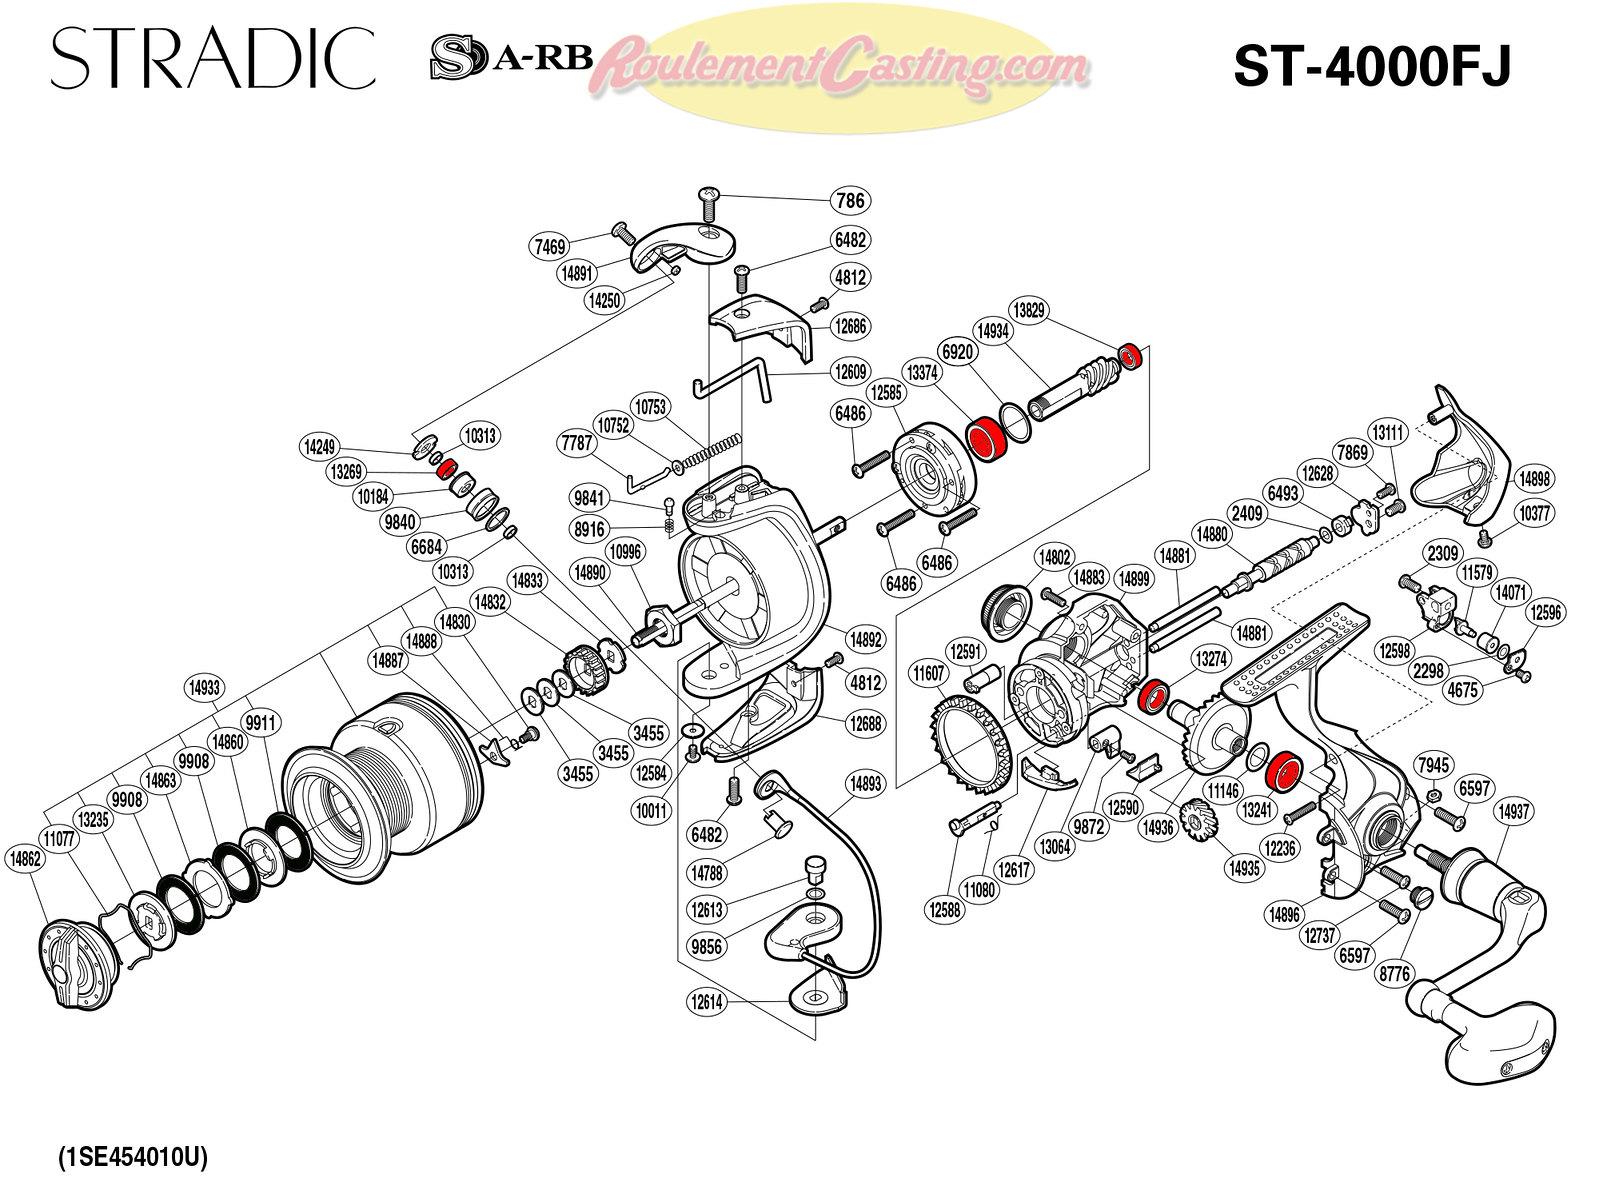 Schema-Stradic-4000Fj